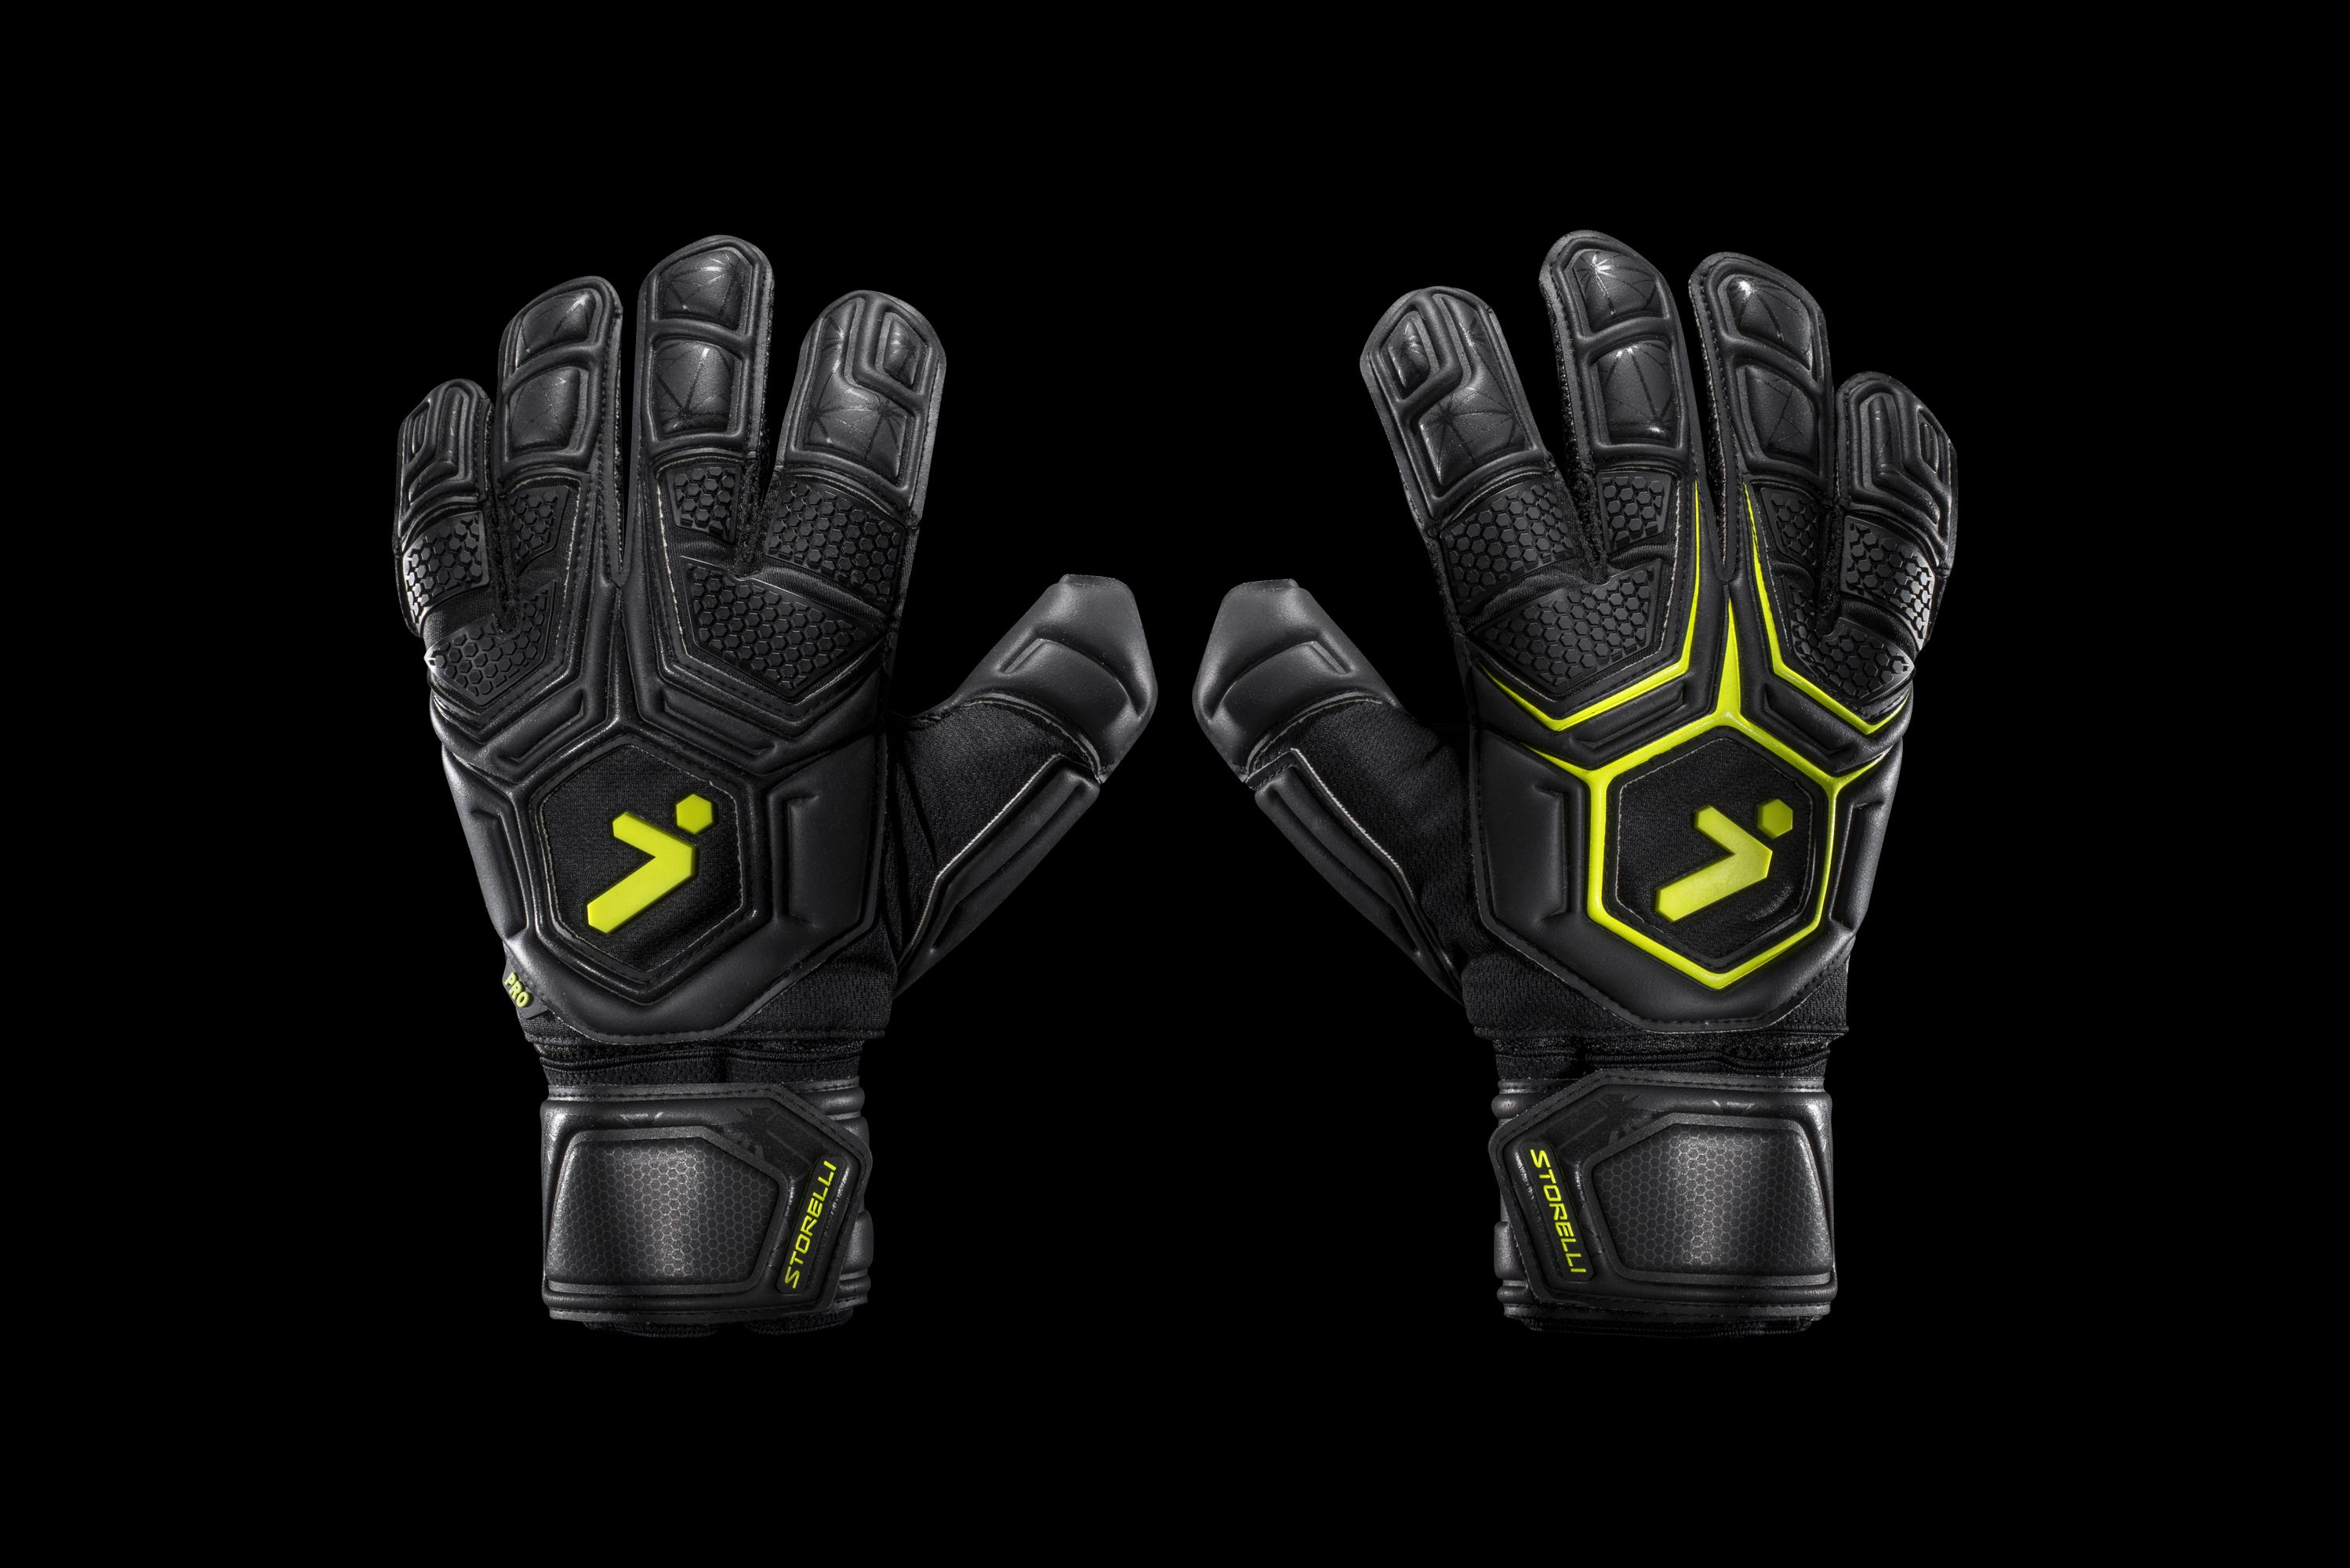 Gladiator Pro Gloves